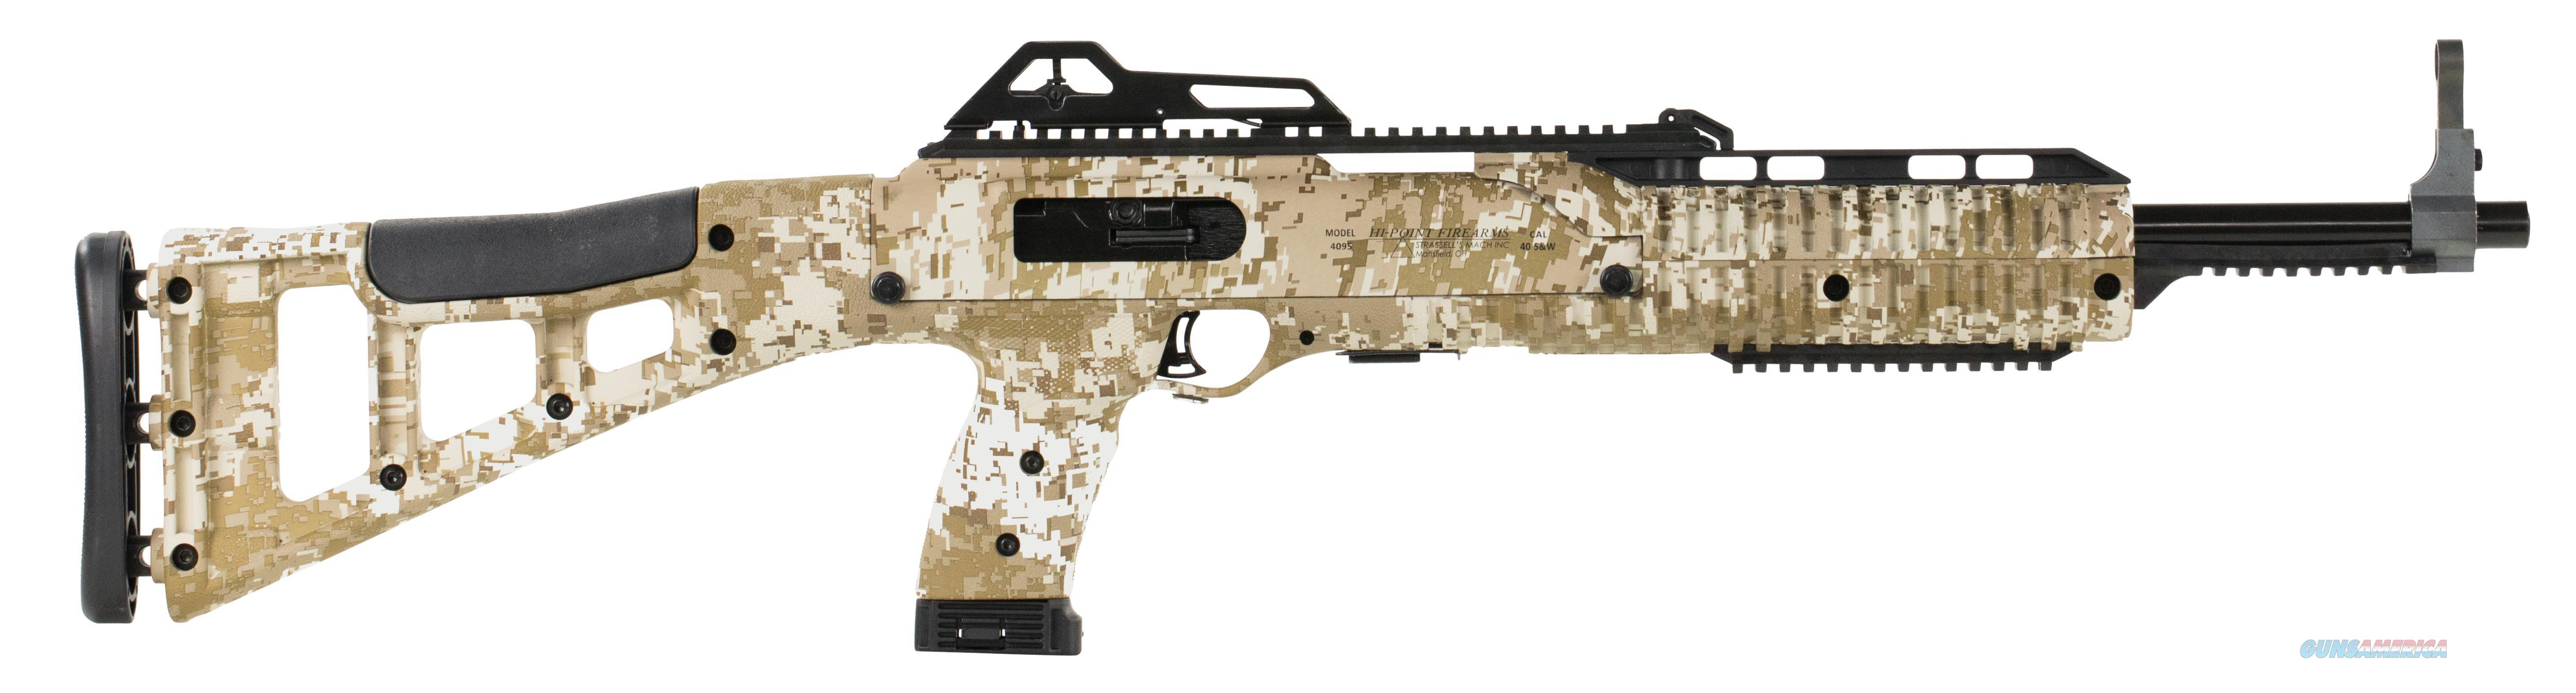 "Hipoint 40Ts Semi-Auto Carbine In Desert Digitial Pattern 17.5"" 10Rd State Law Apply 4095TSDD  Guns > Rifles > H Misc Rifles"